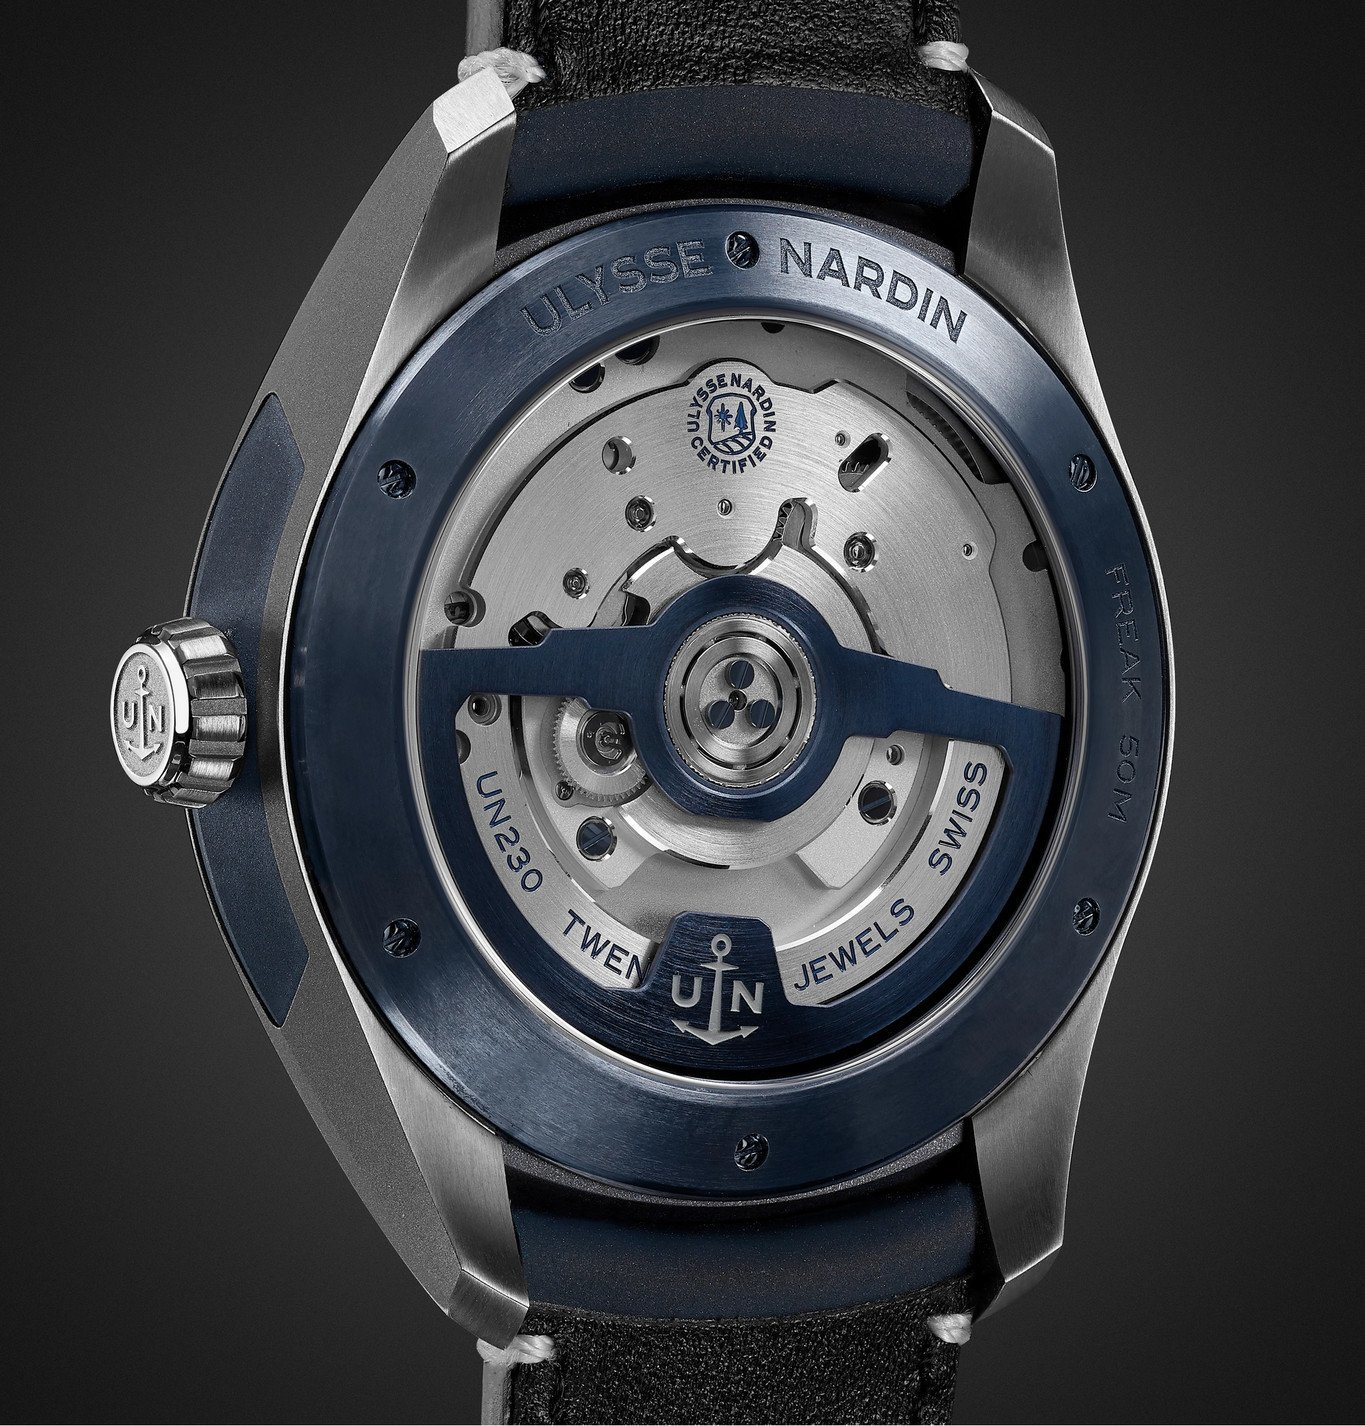 Ulysse Nardin - Freak X Automatic 43mm Titanium and Leather Watch, Ref. No. 2303-270.1/03 - Blue